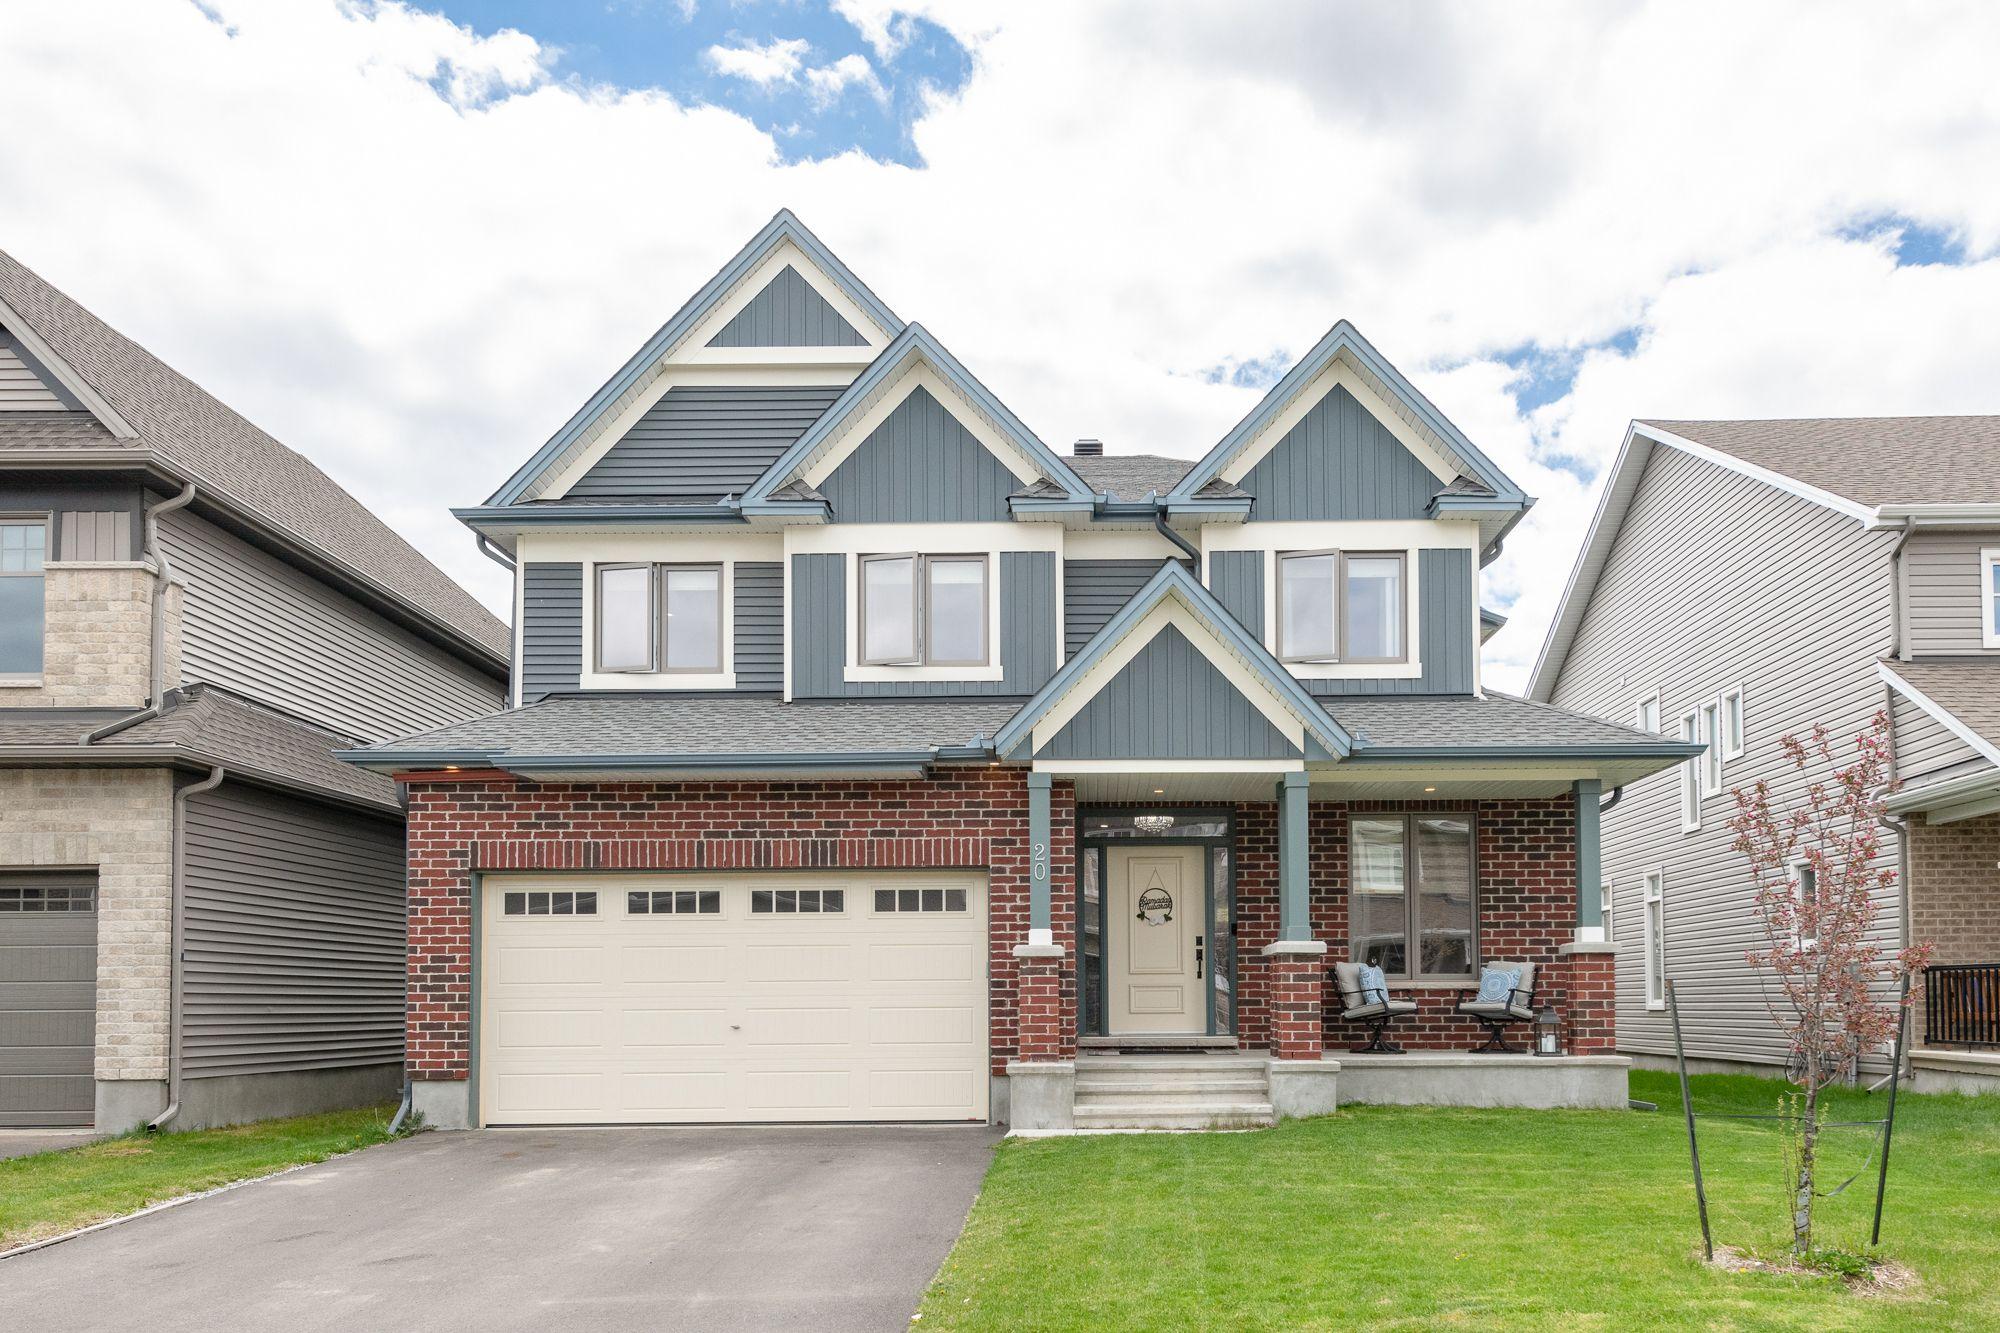 Main Photo: 20 SAGEBRUSH Crescent in Ottawa: House for sale : MLS®# 1243333